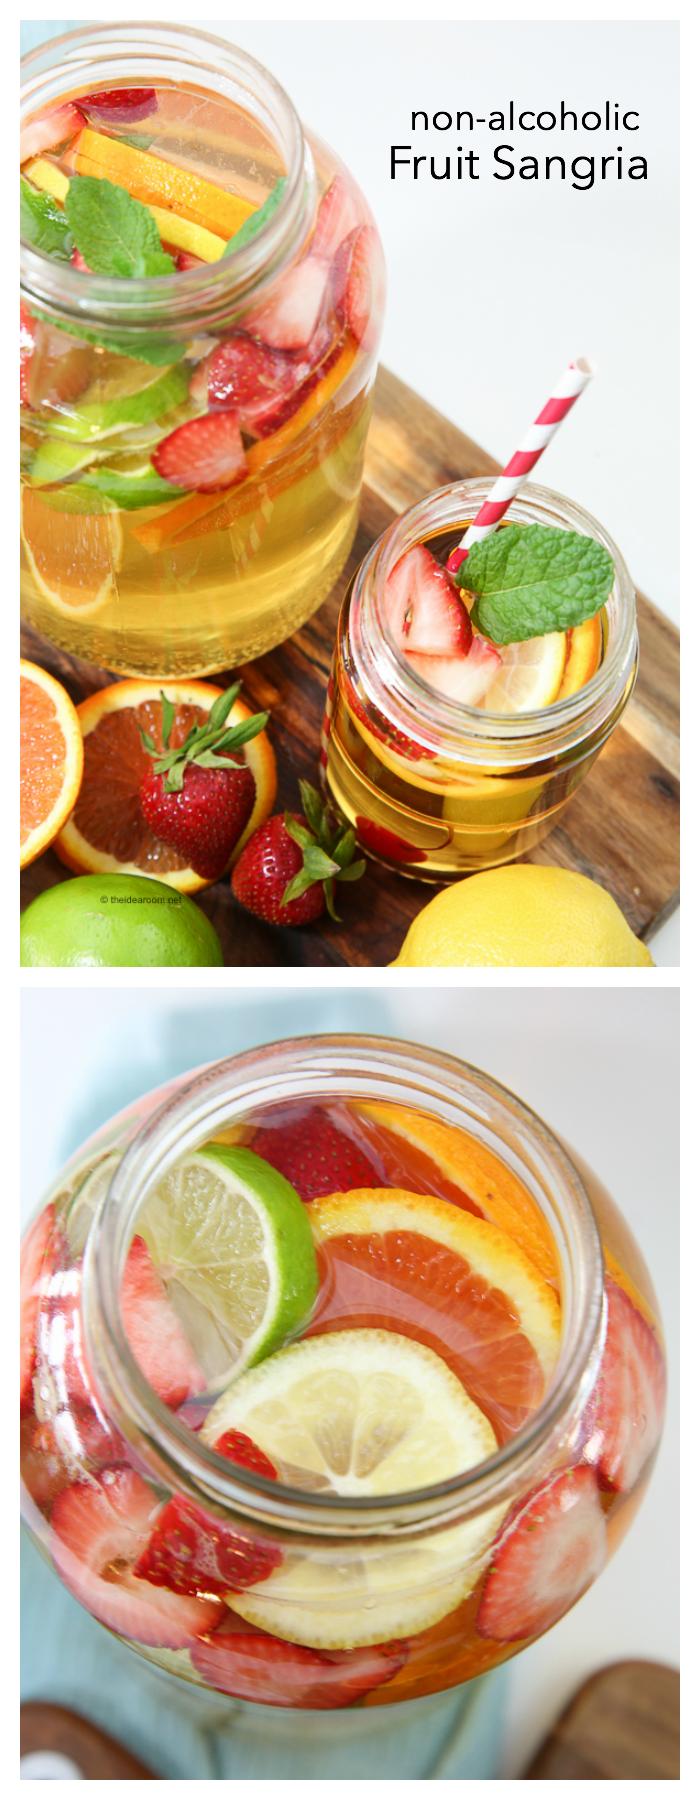 Homemade Alcoholic Fruit Drink